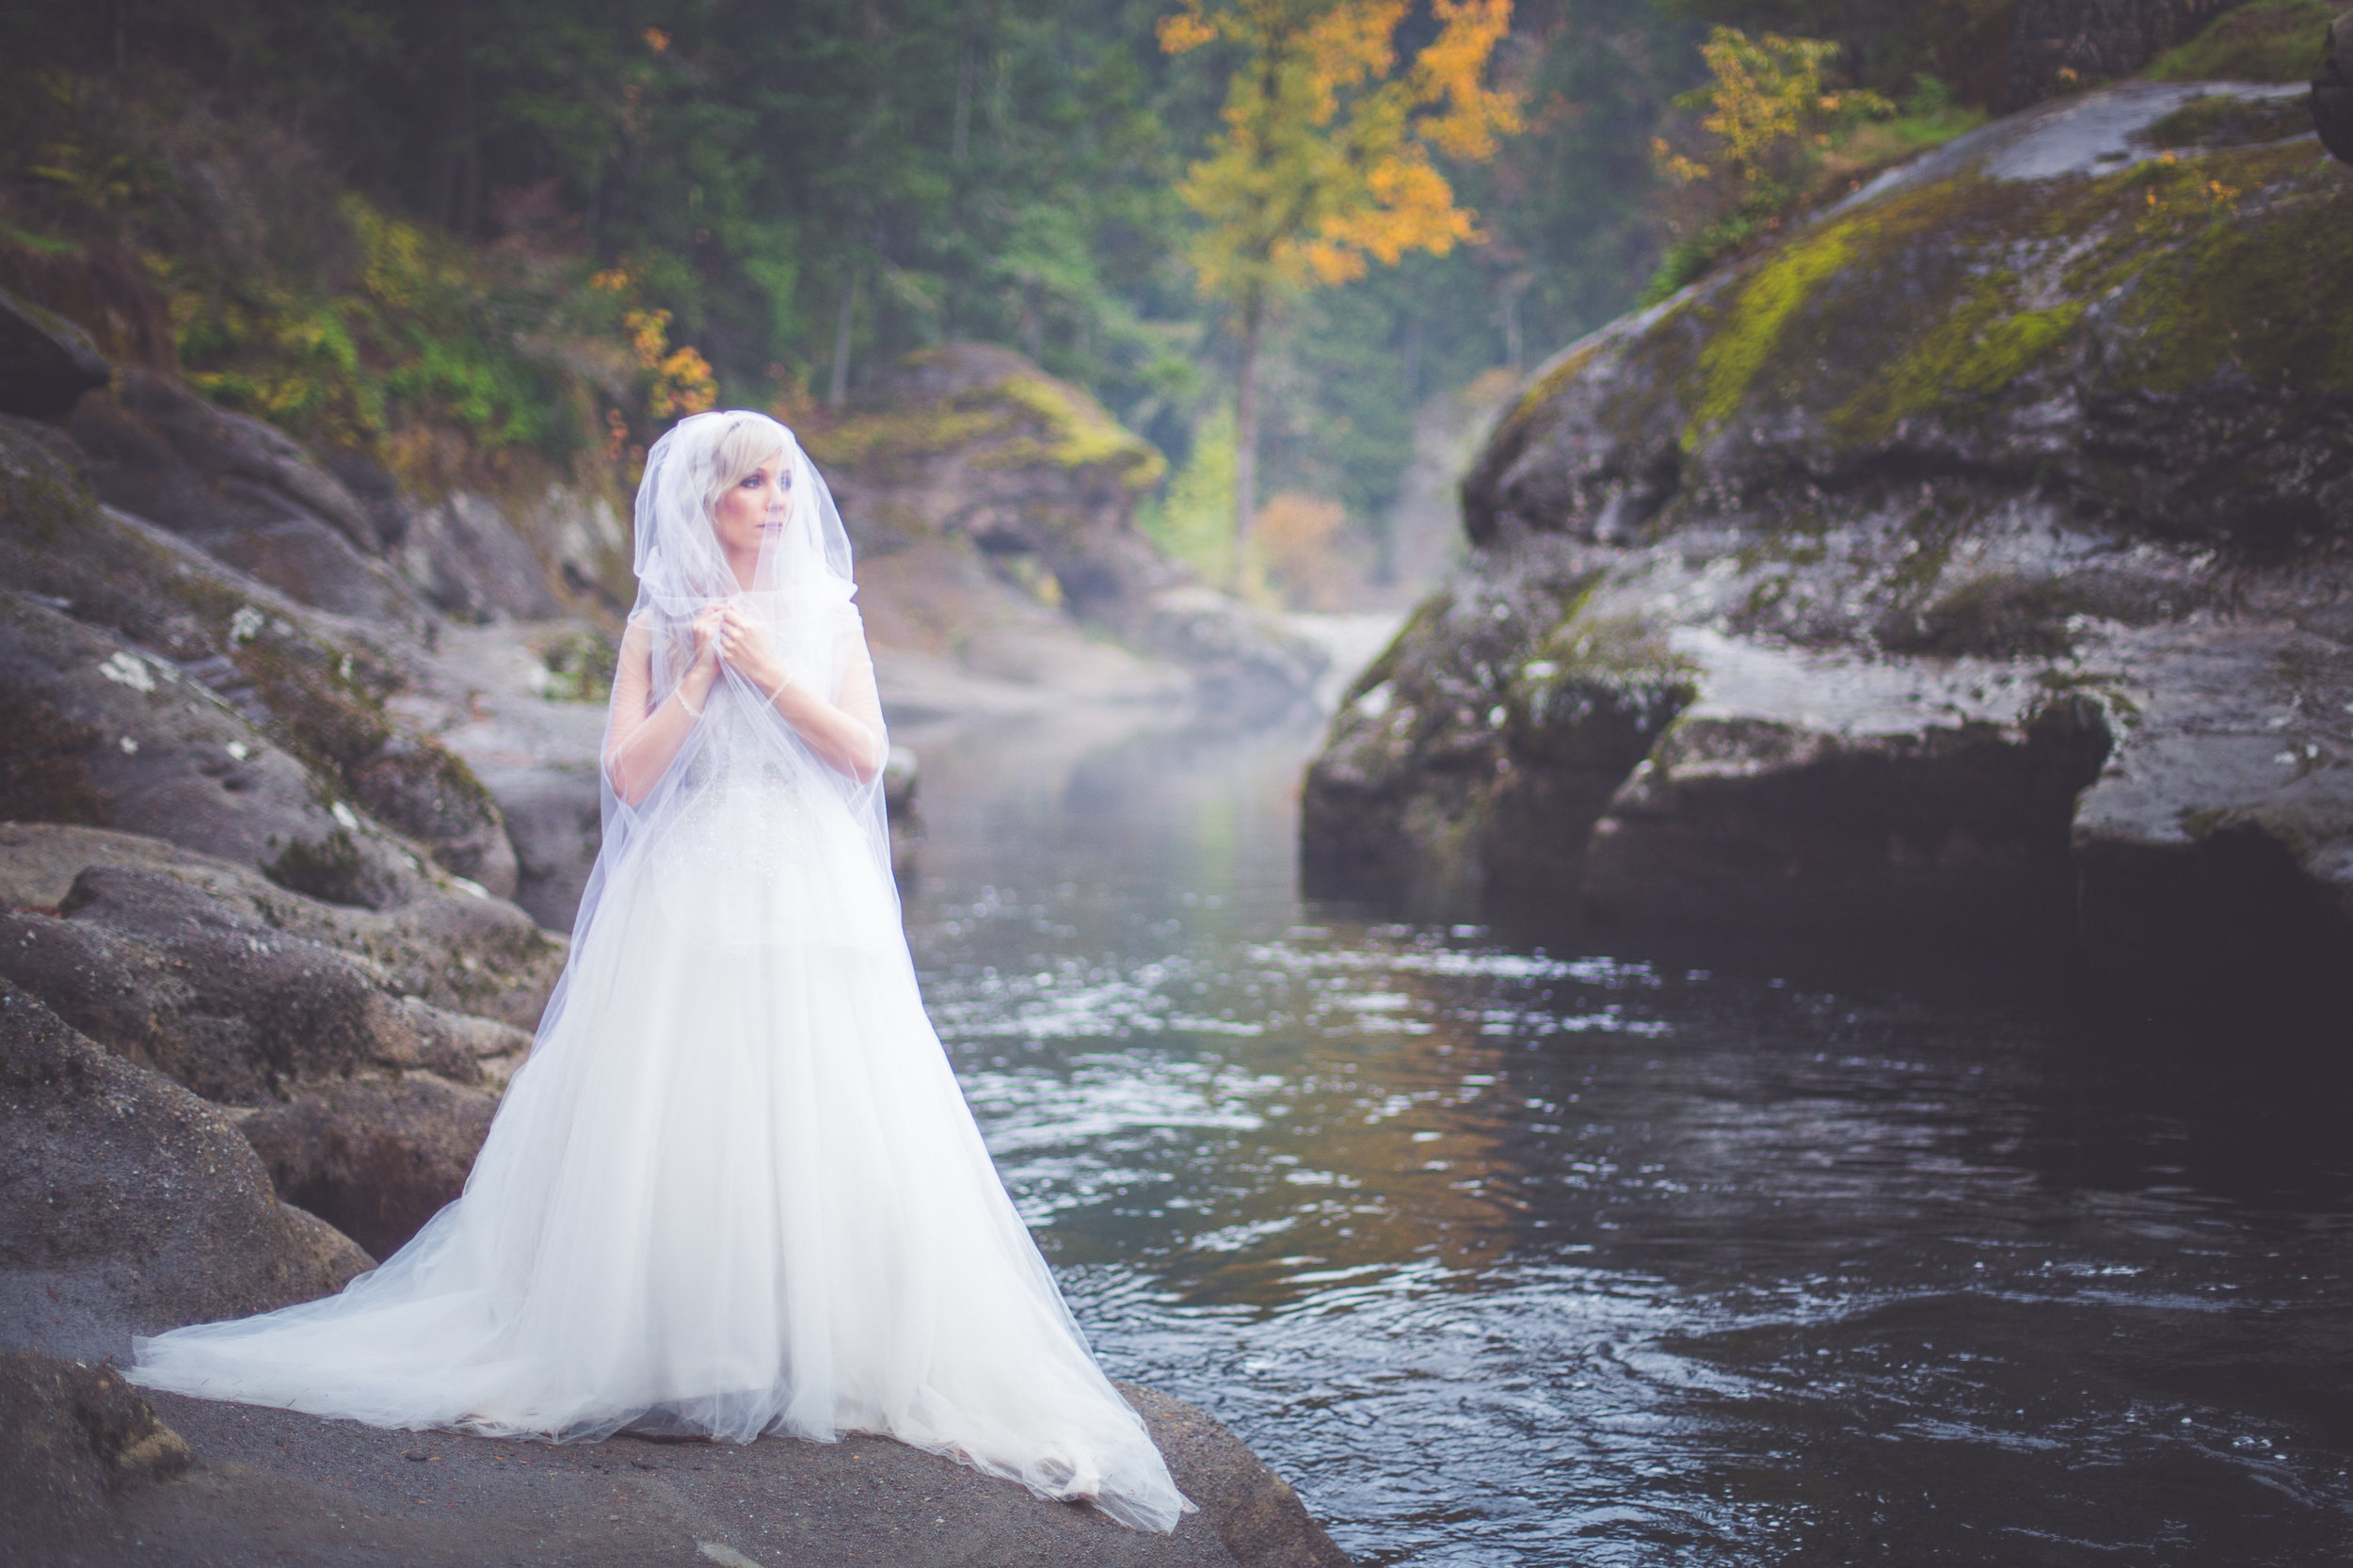 whimsical-romantic-wedding-top-bridge-17.jpg